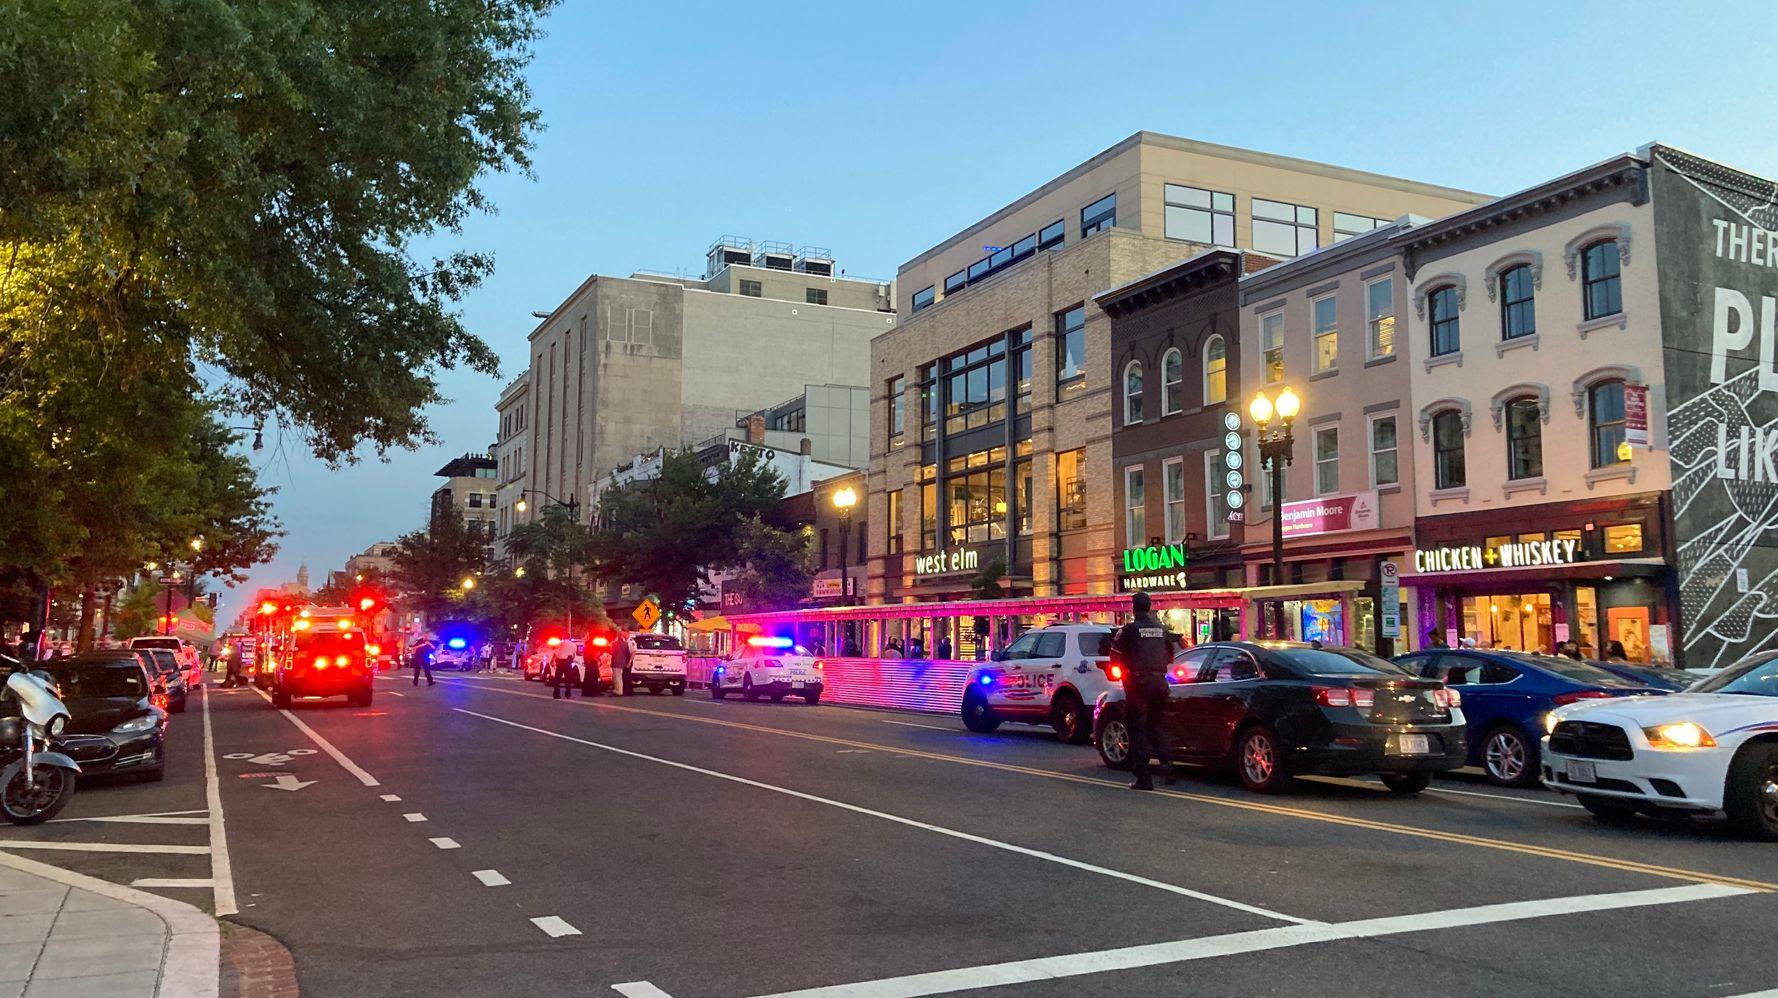 2 People Shot In Popular Washington Restaurant District